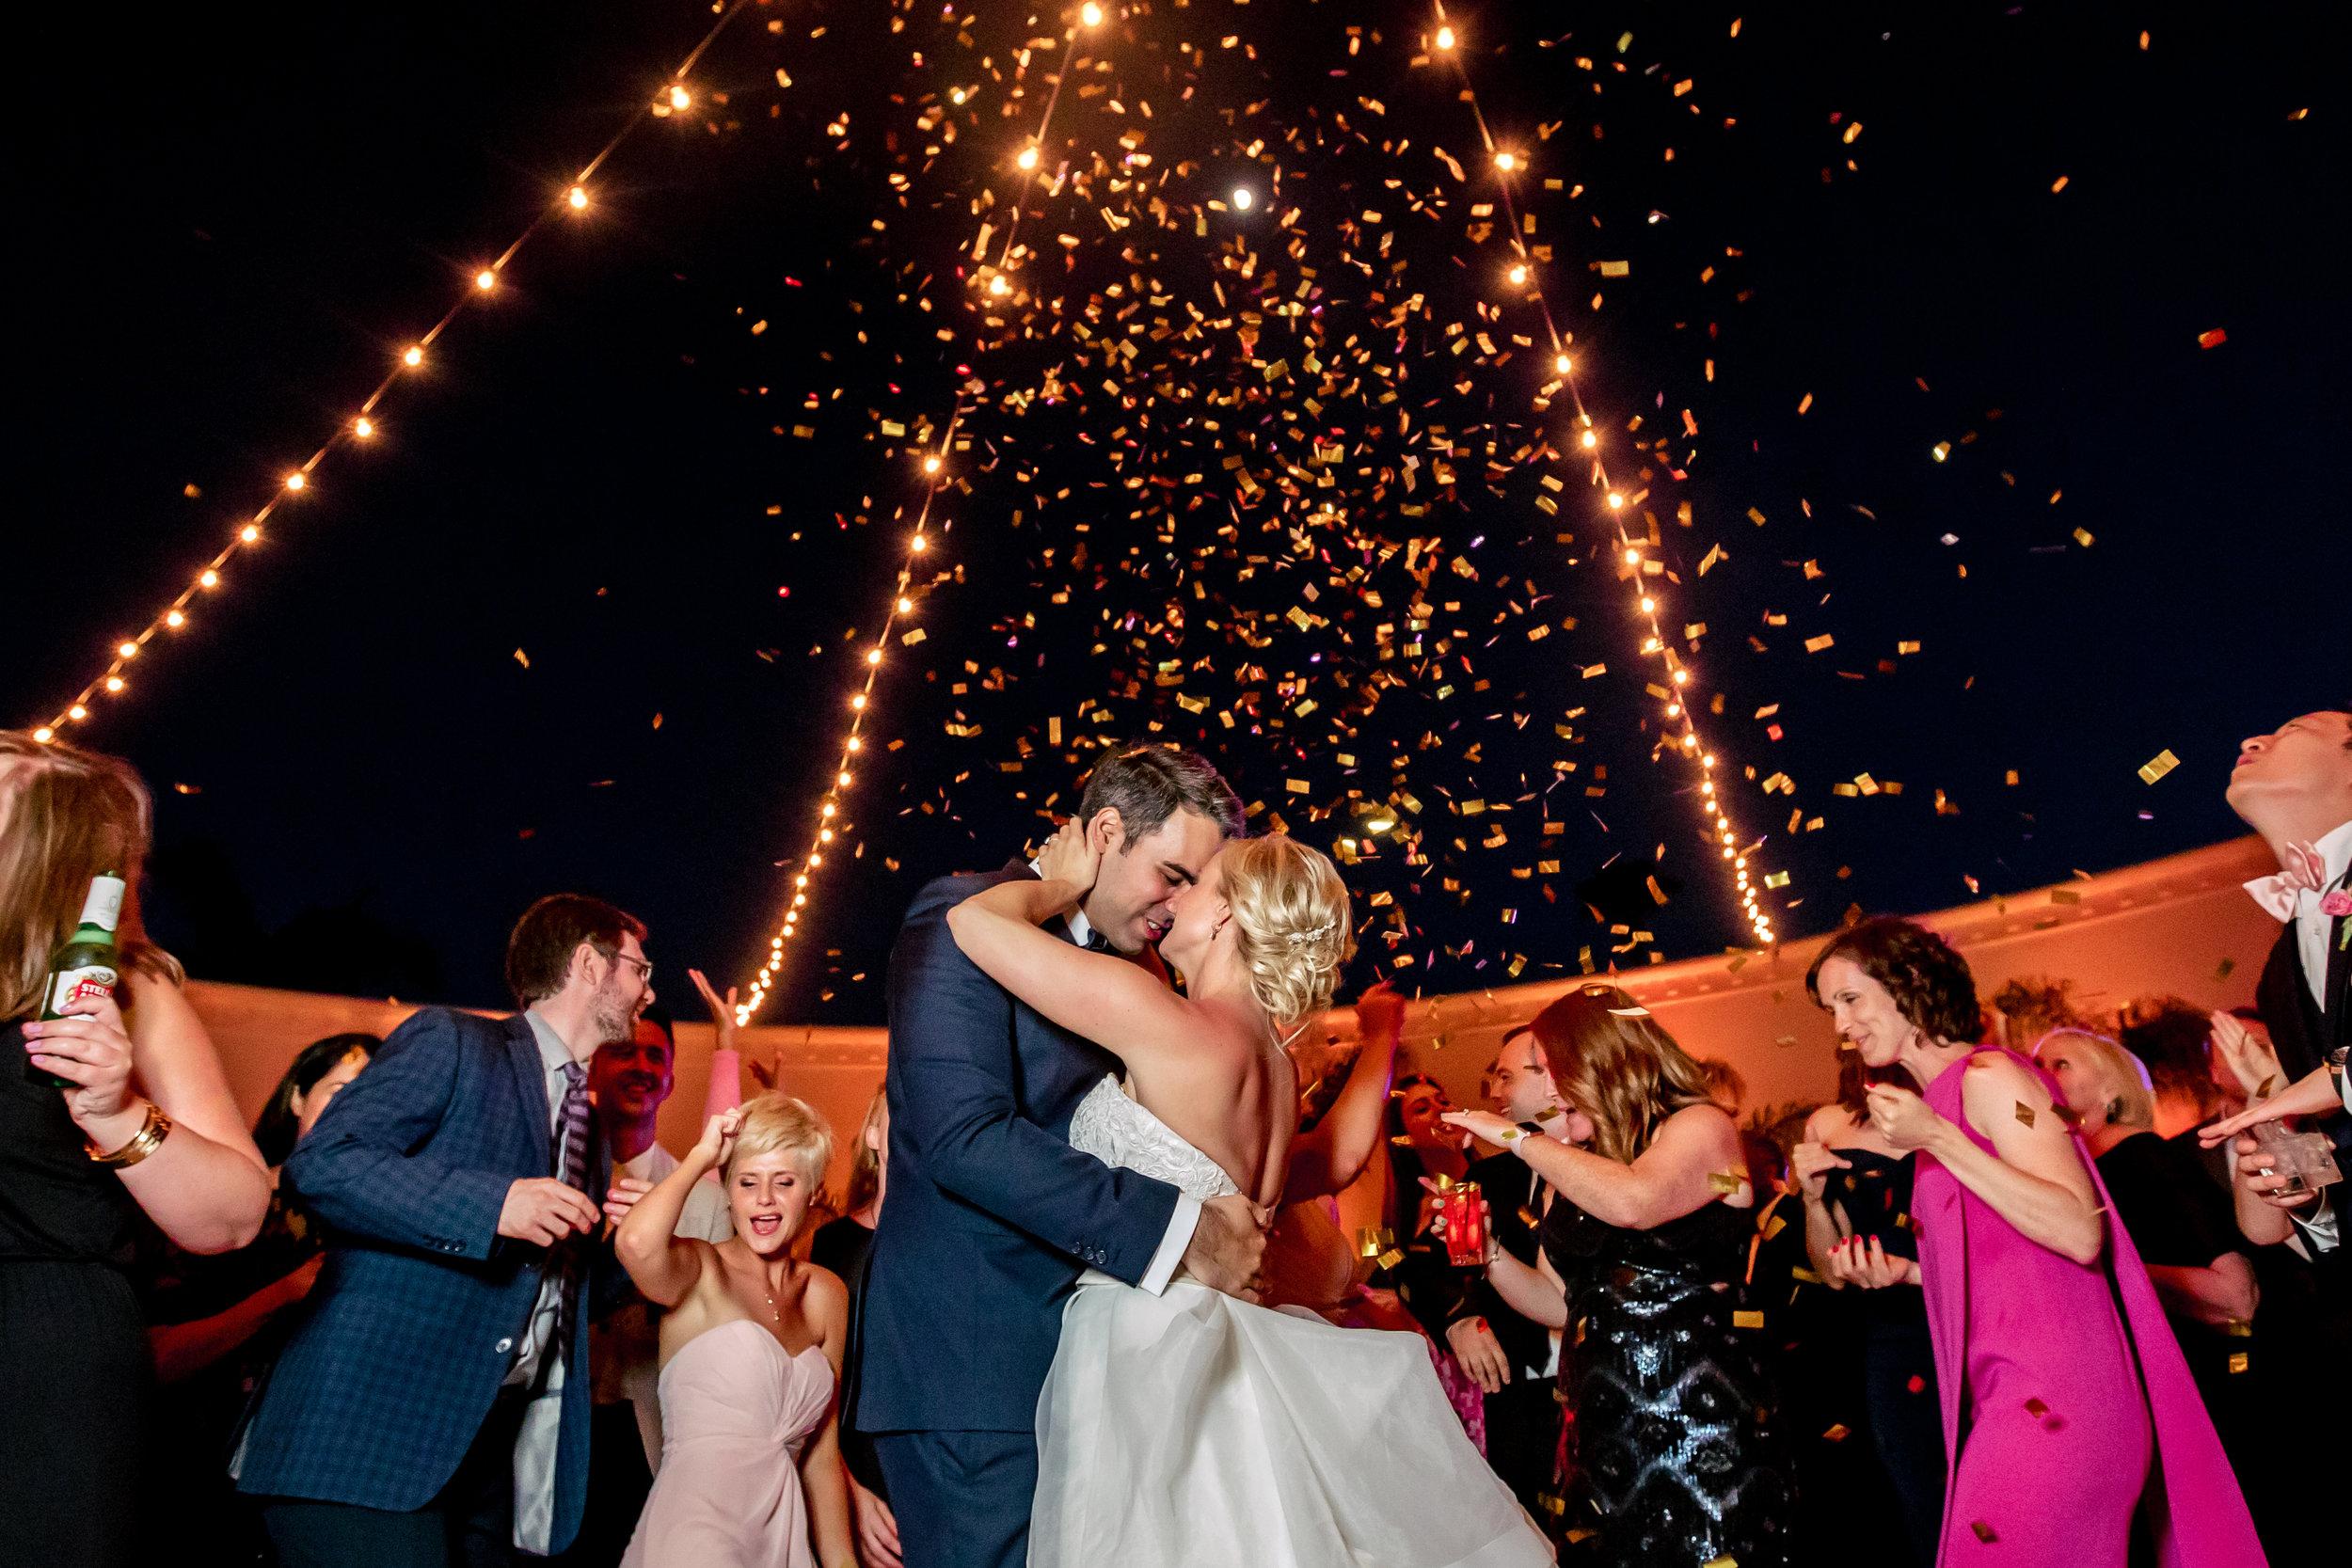 www.santabarbarawedding.com   Rewind Photography   Hilton Santa Barbara Beachfront Resort   Events by M and M   Bride and Groom   Confetti